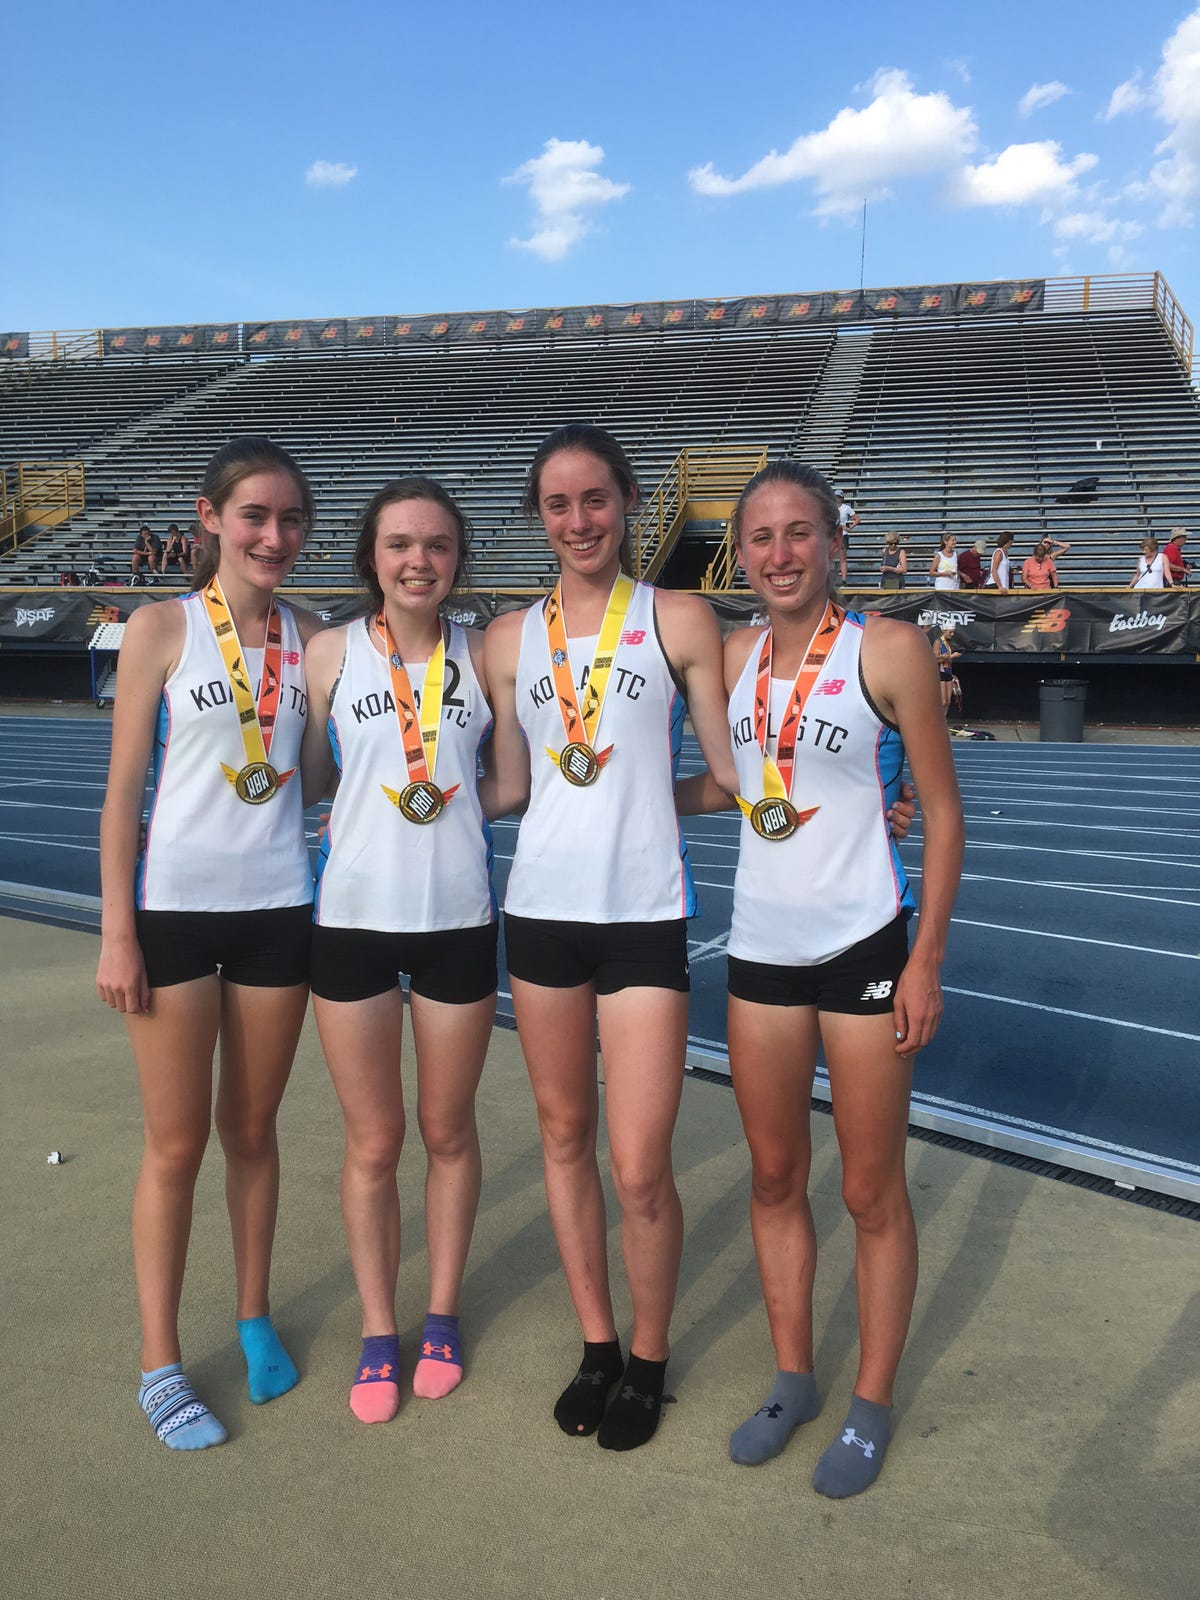 Track: Katelyn Tuohy breaks girls U S  high school record in